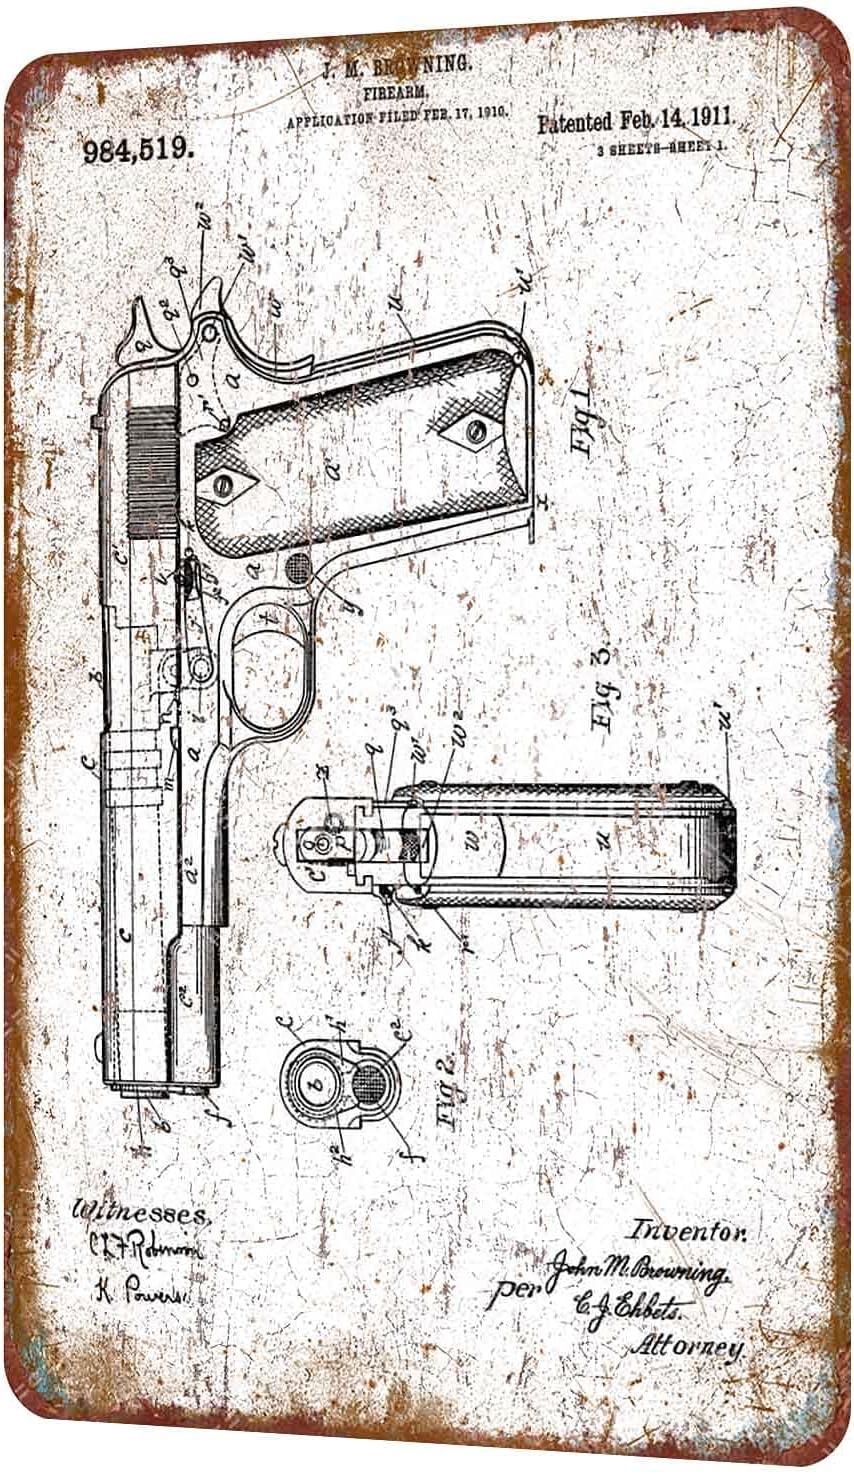 1911 Colt M1911 Patent John Browning Vintage Estilo Shabby Chic Cartel de Metal decoración de Pared 8 x 12 Pulgadas